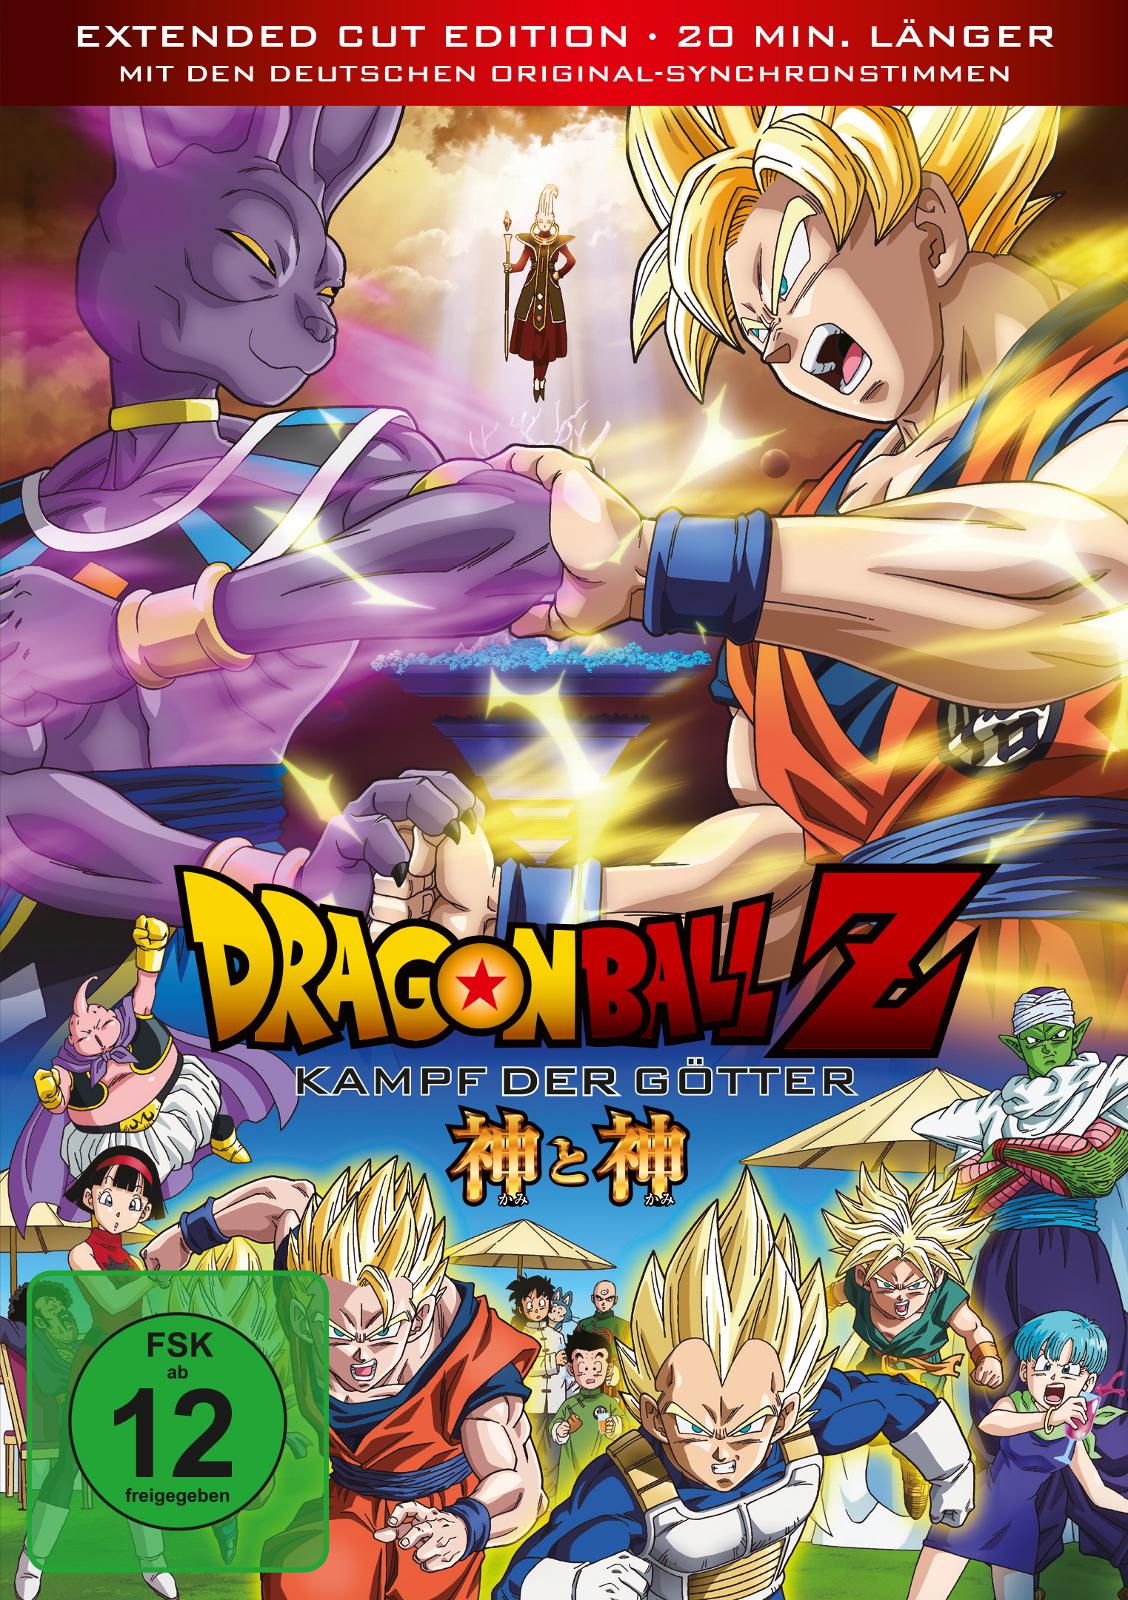 Dragonball Z HD Stream - streamit.to